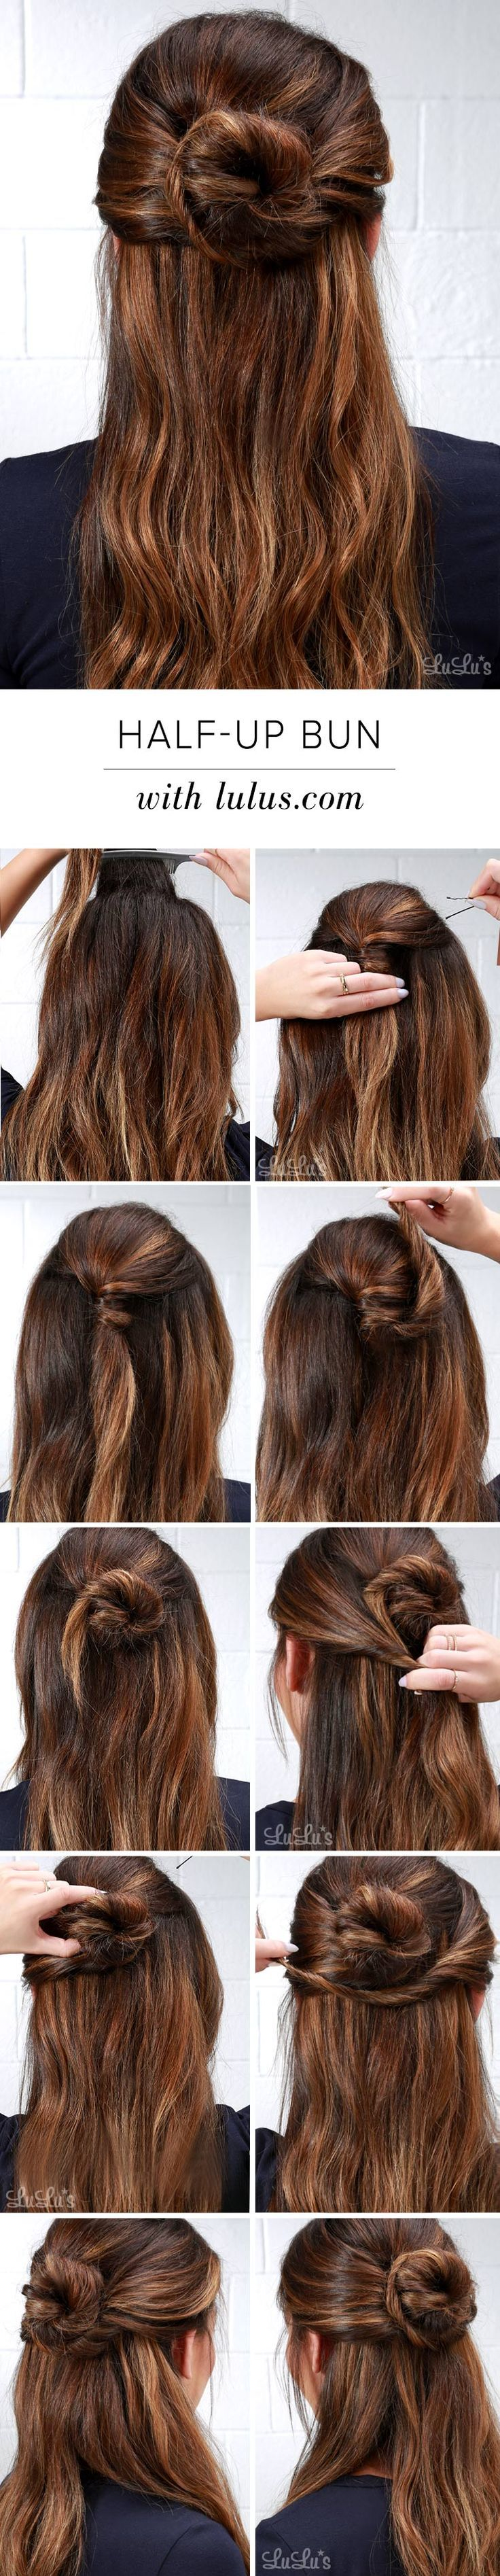 156 best Hair Tutorials images on Pinterest